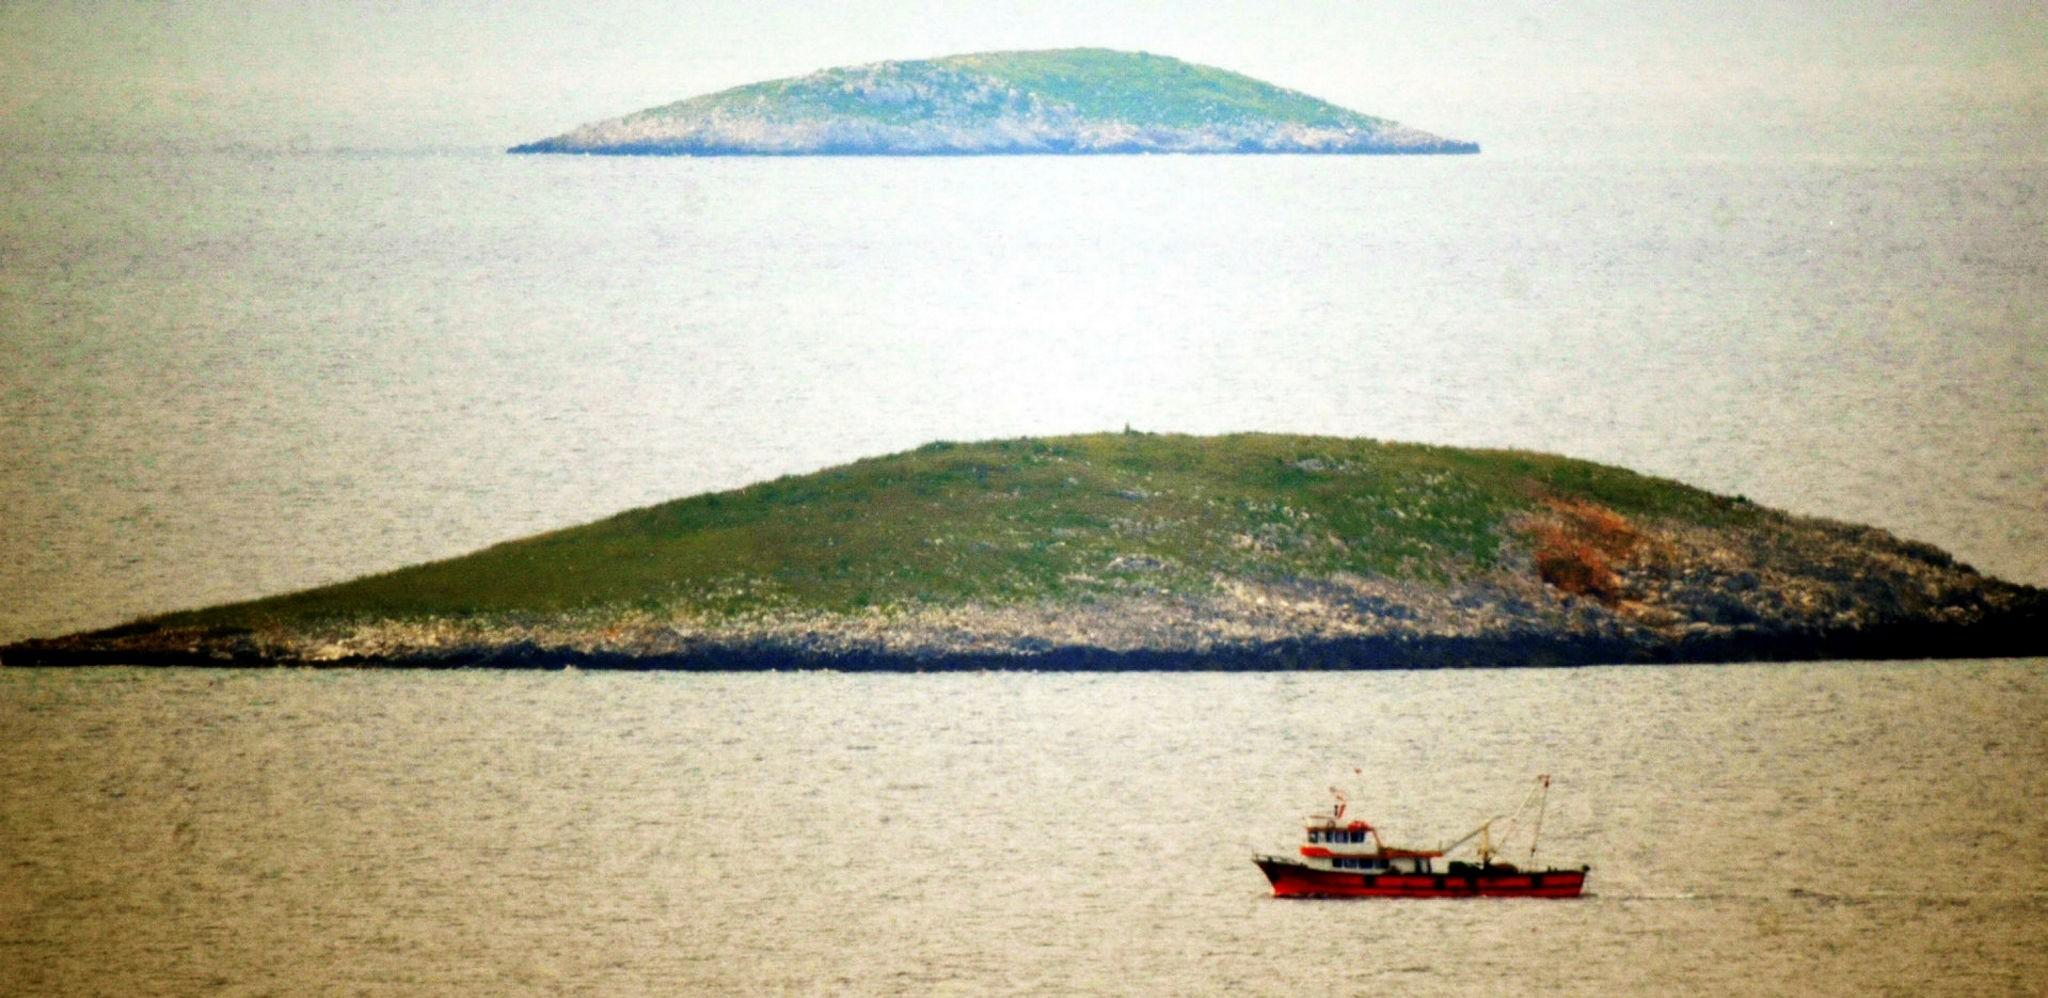 Kardak islets (DHA Photo)